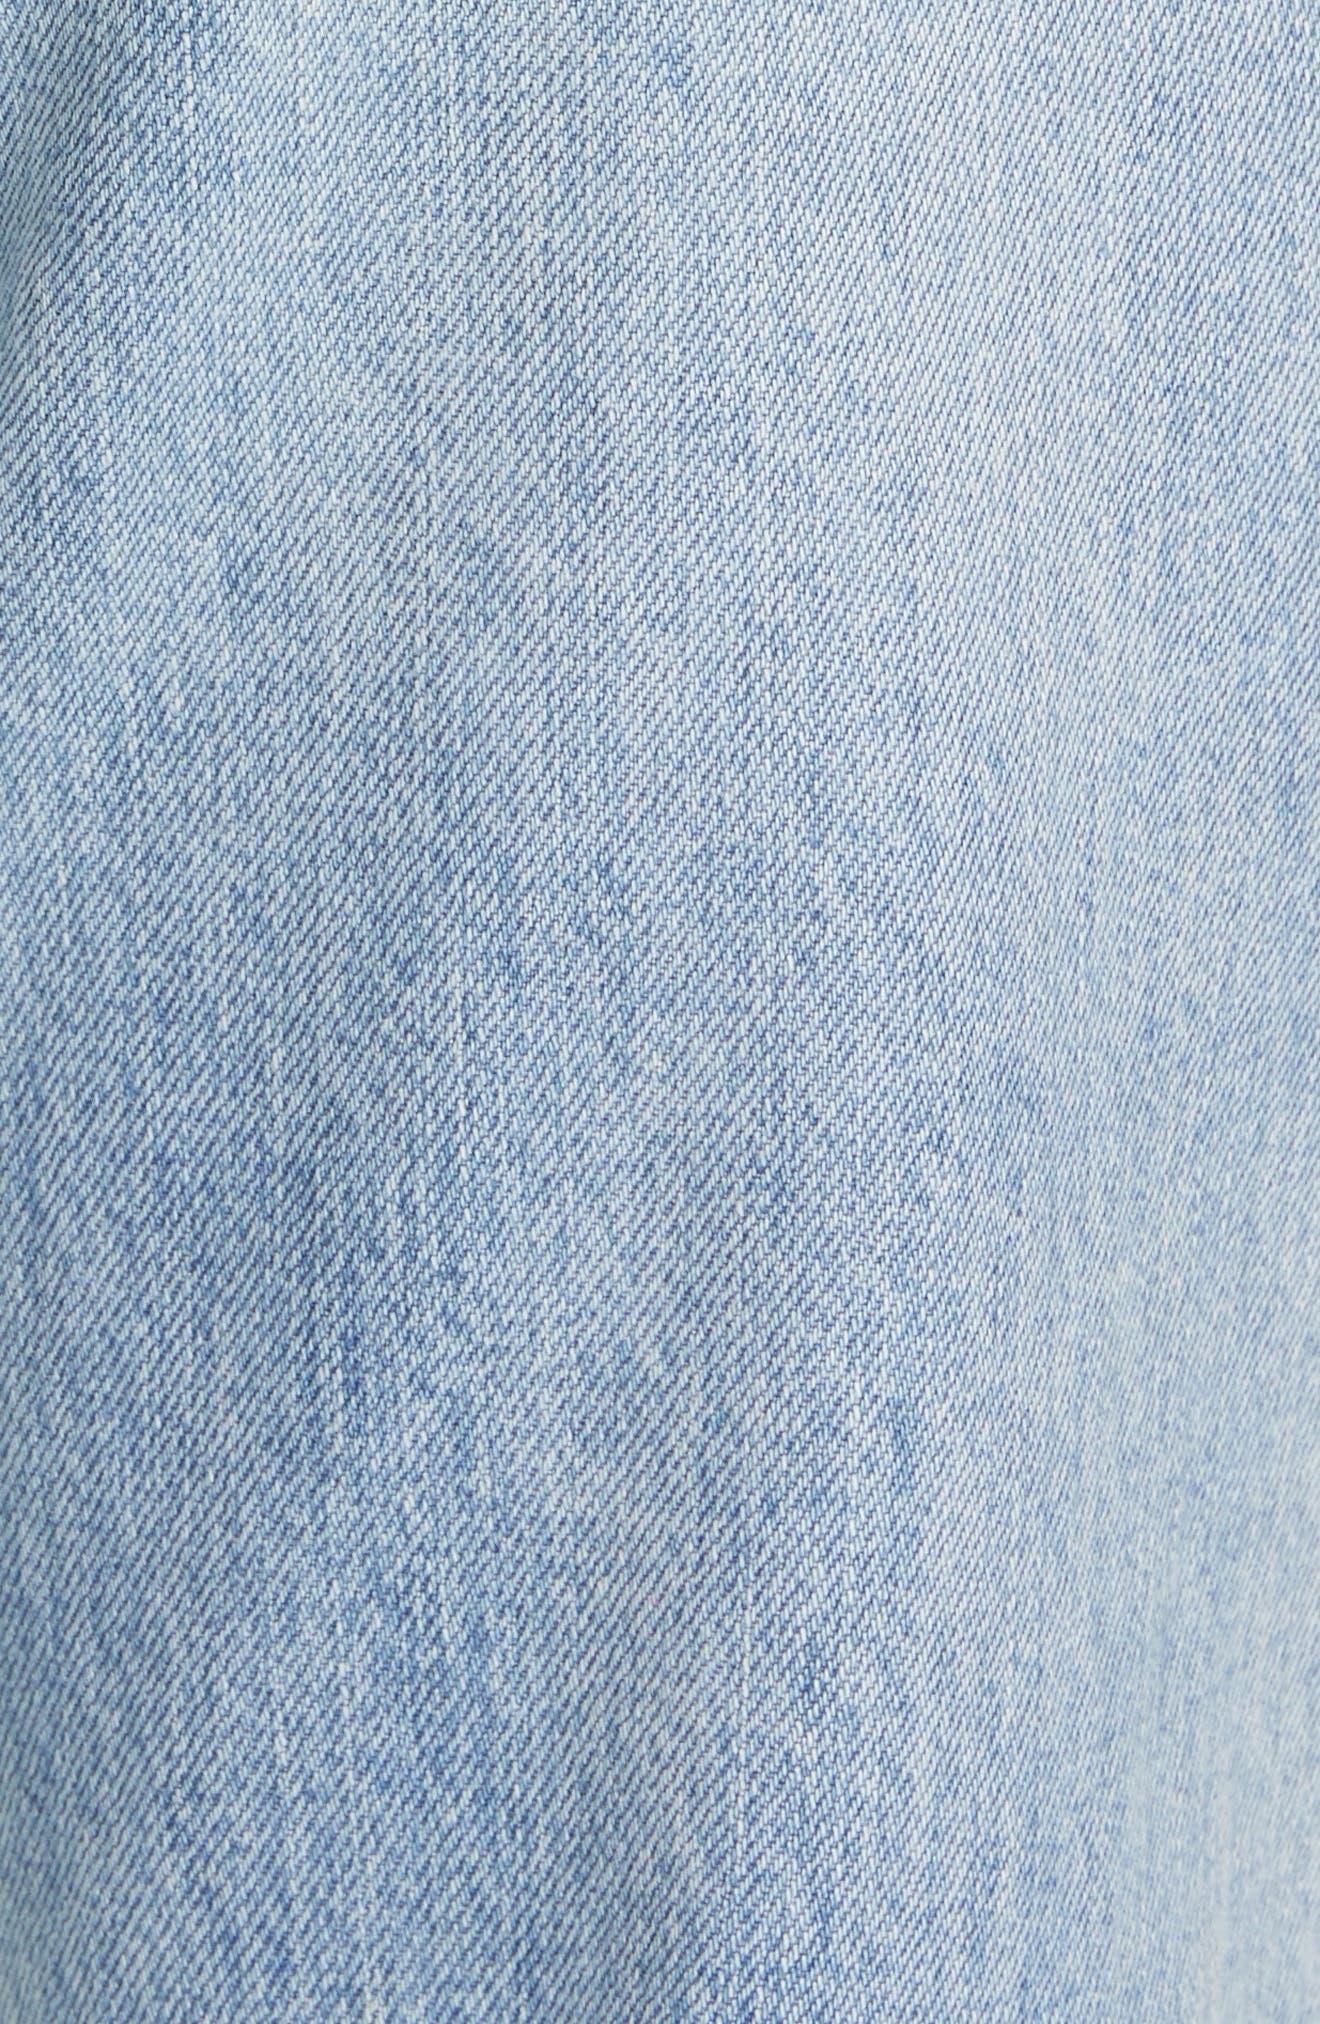 LA VIE REBECCA TAYLOR, Sylvie High Waist Jeans, Alternate thumbnail 6, color, CHANTAL WASH